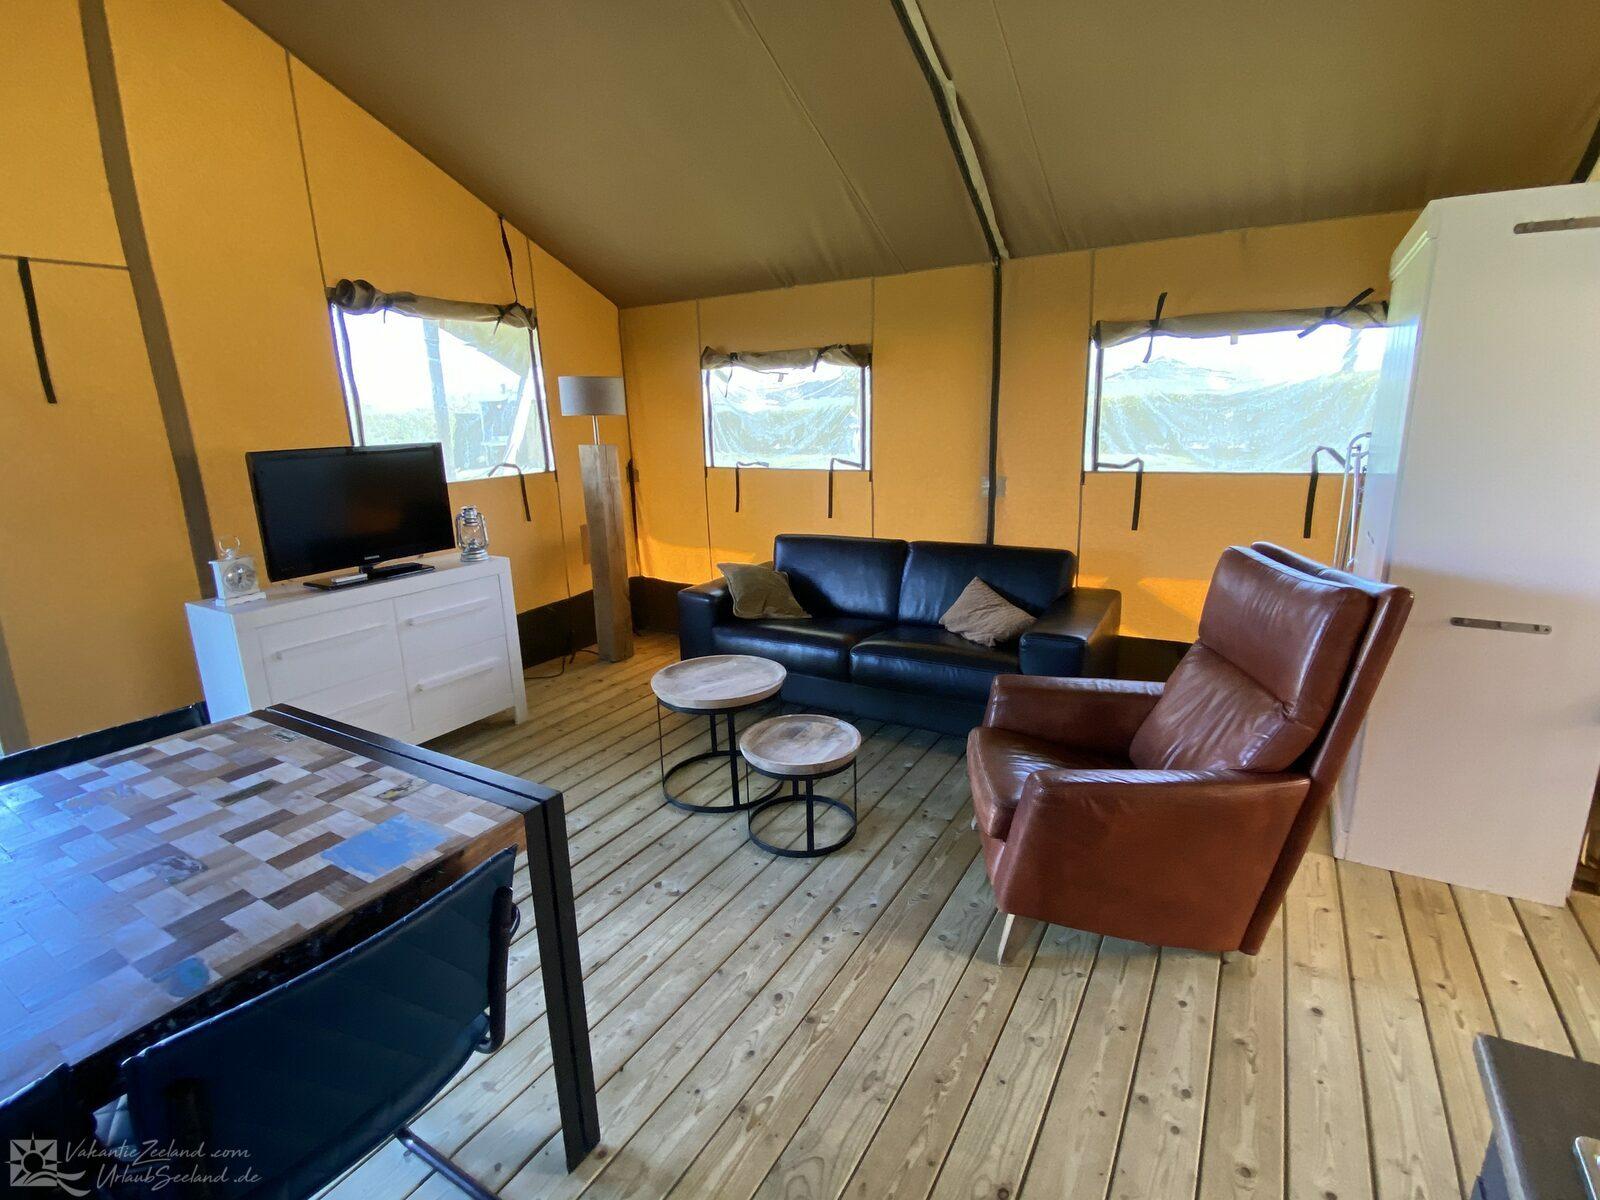 VZ785 Safari tent in Ellemeet